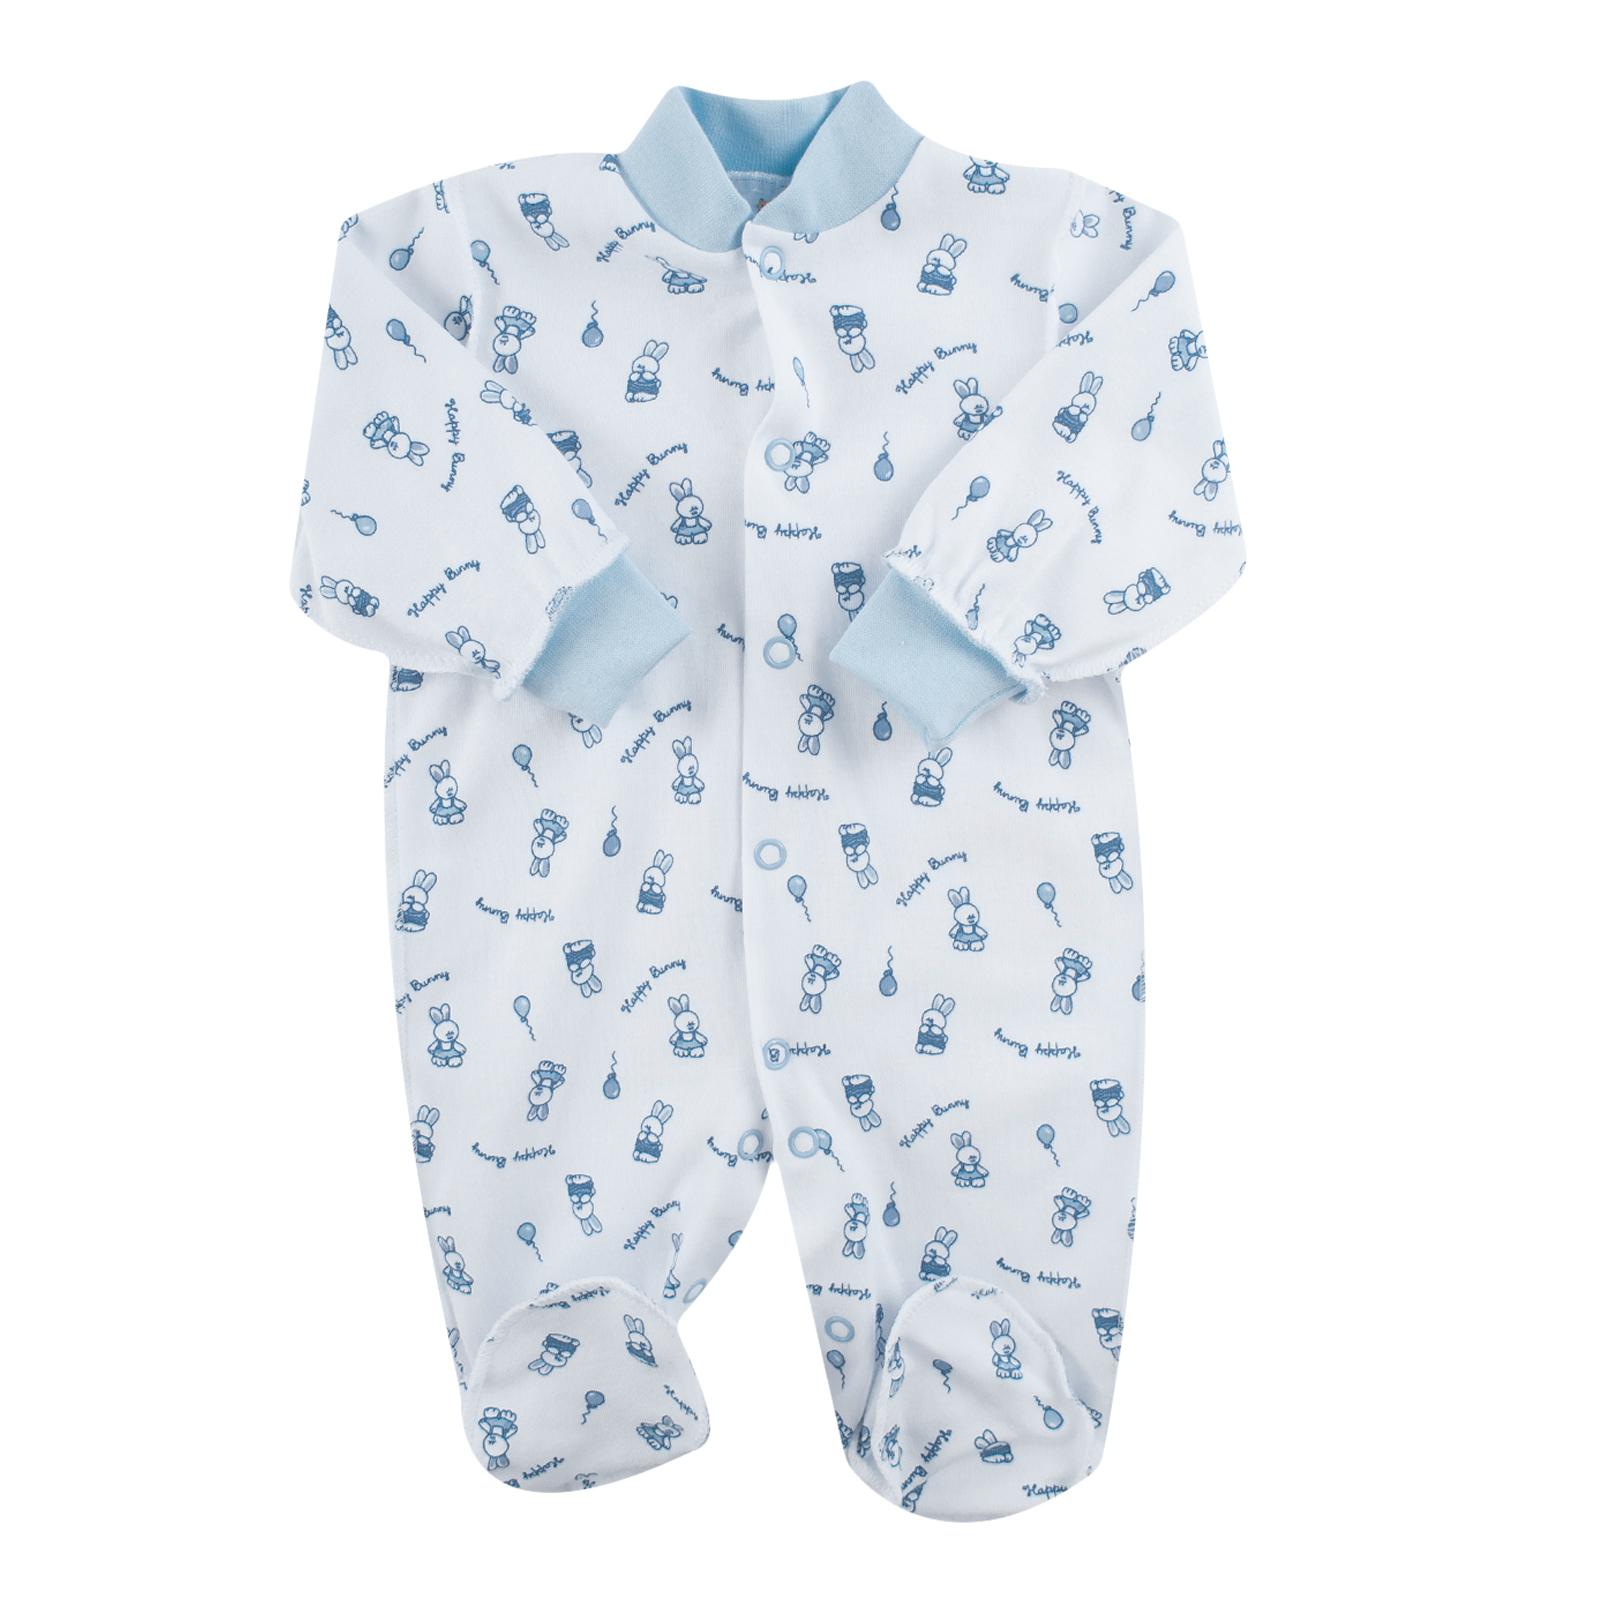 Комбинезон КОТМАРКОТ для мальчика, цвет набивка голубой тон 0-1 мес (размер 50)<br>